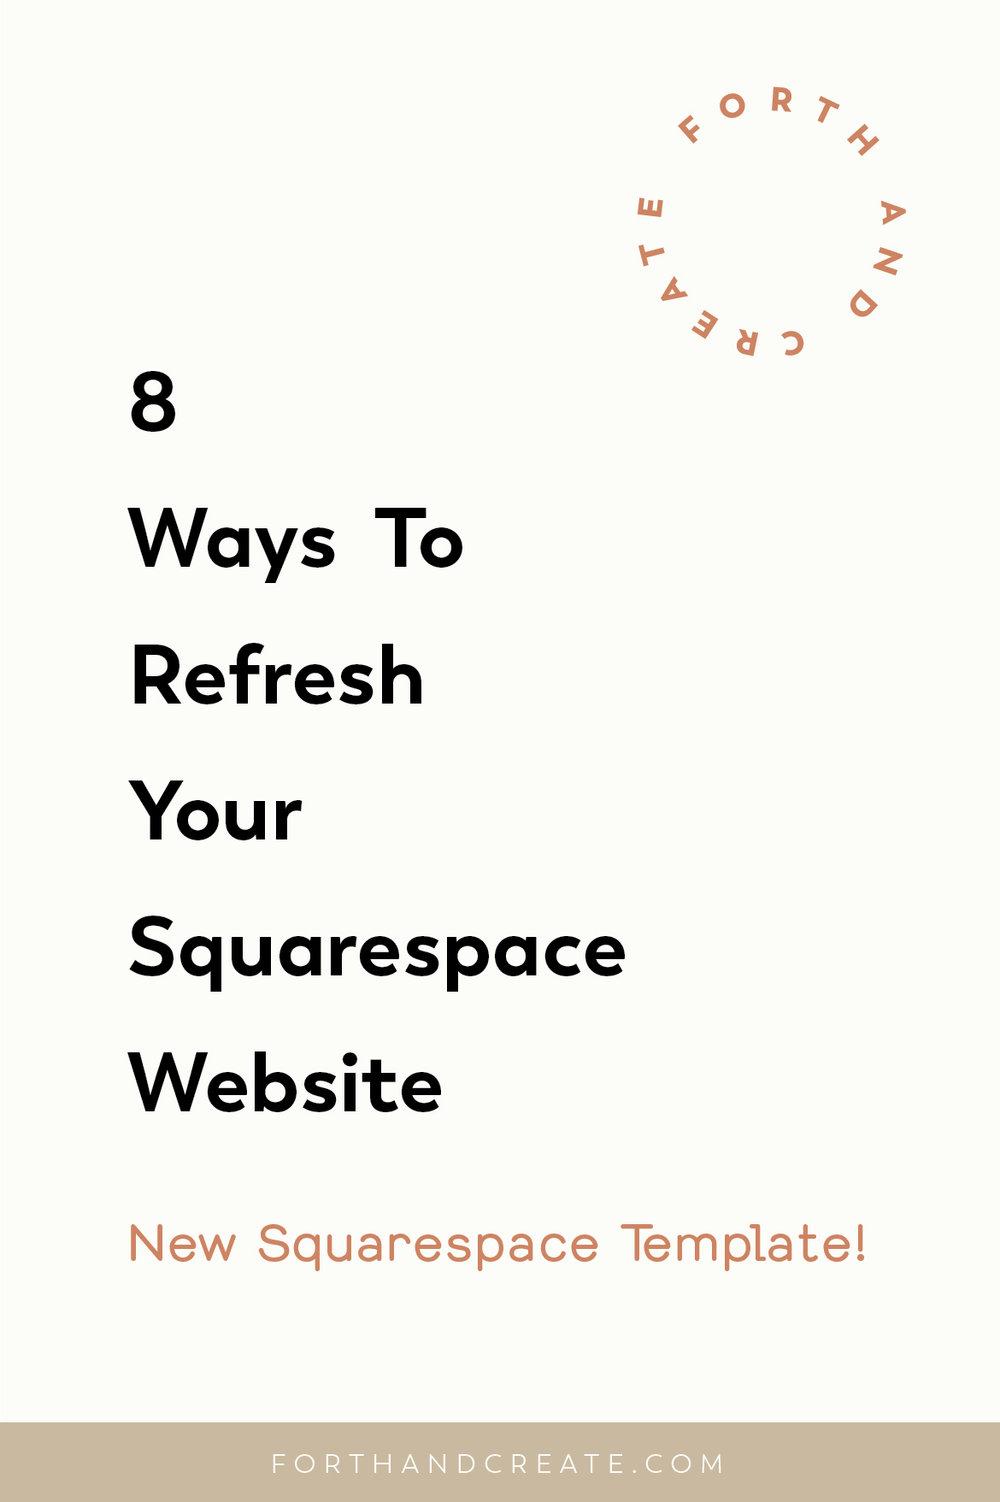 8-Ways-To-Refresh-Squarespace-Website.jpg